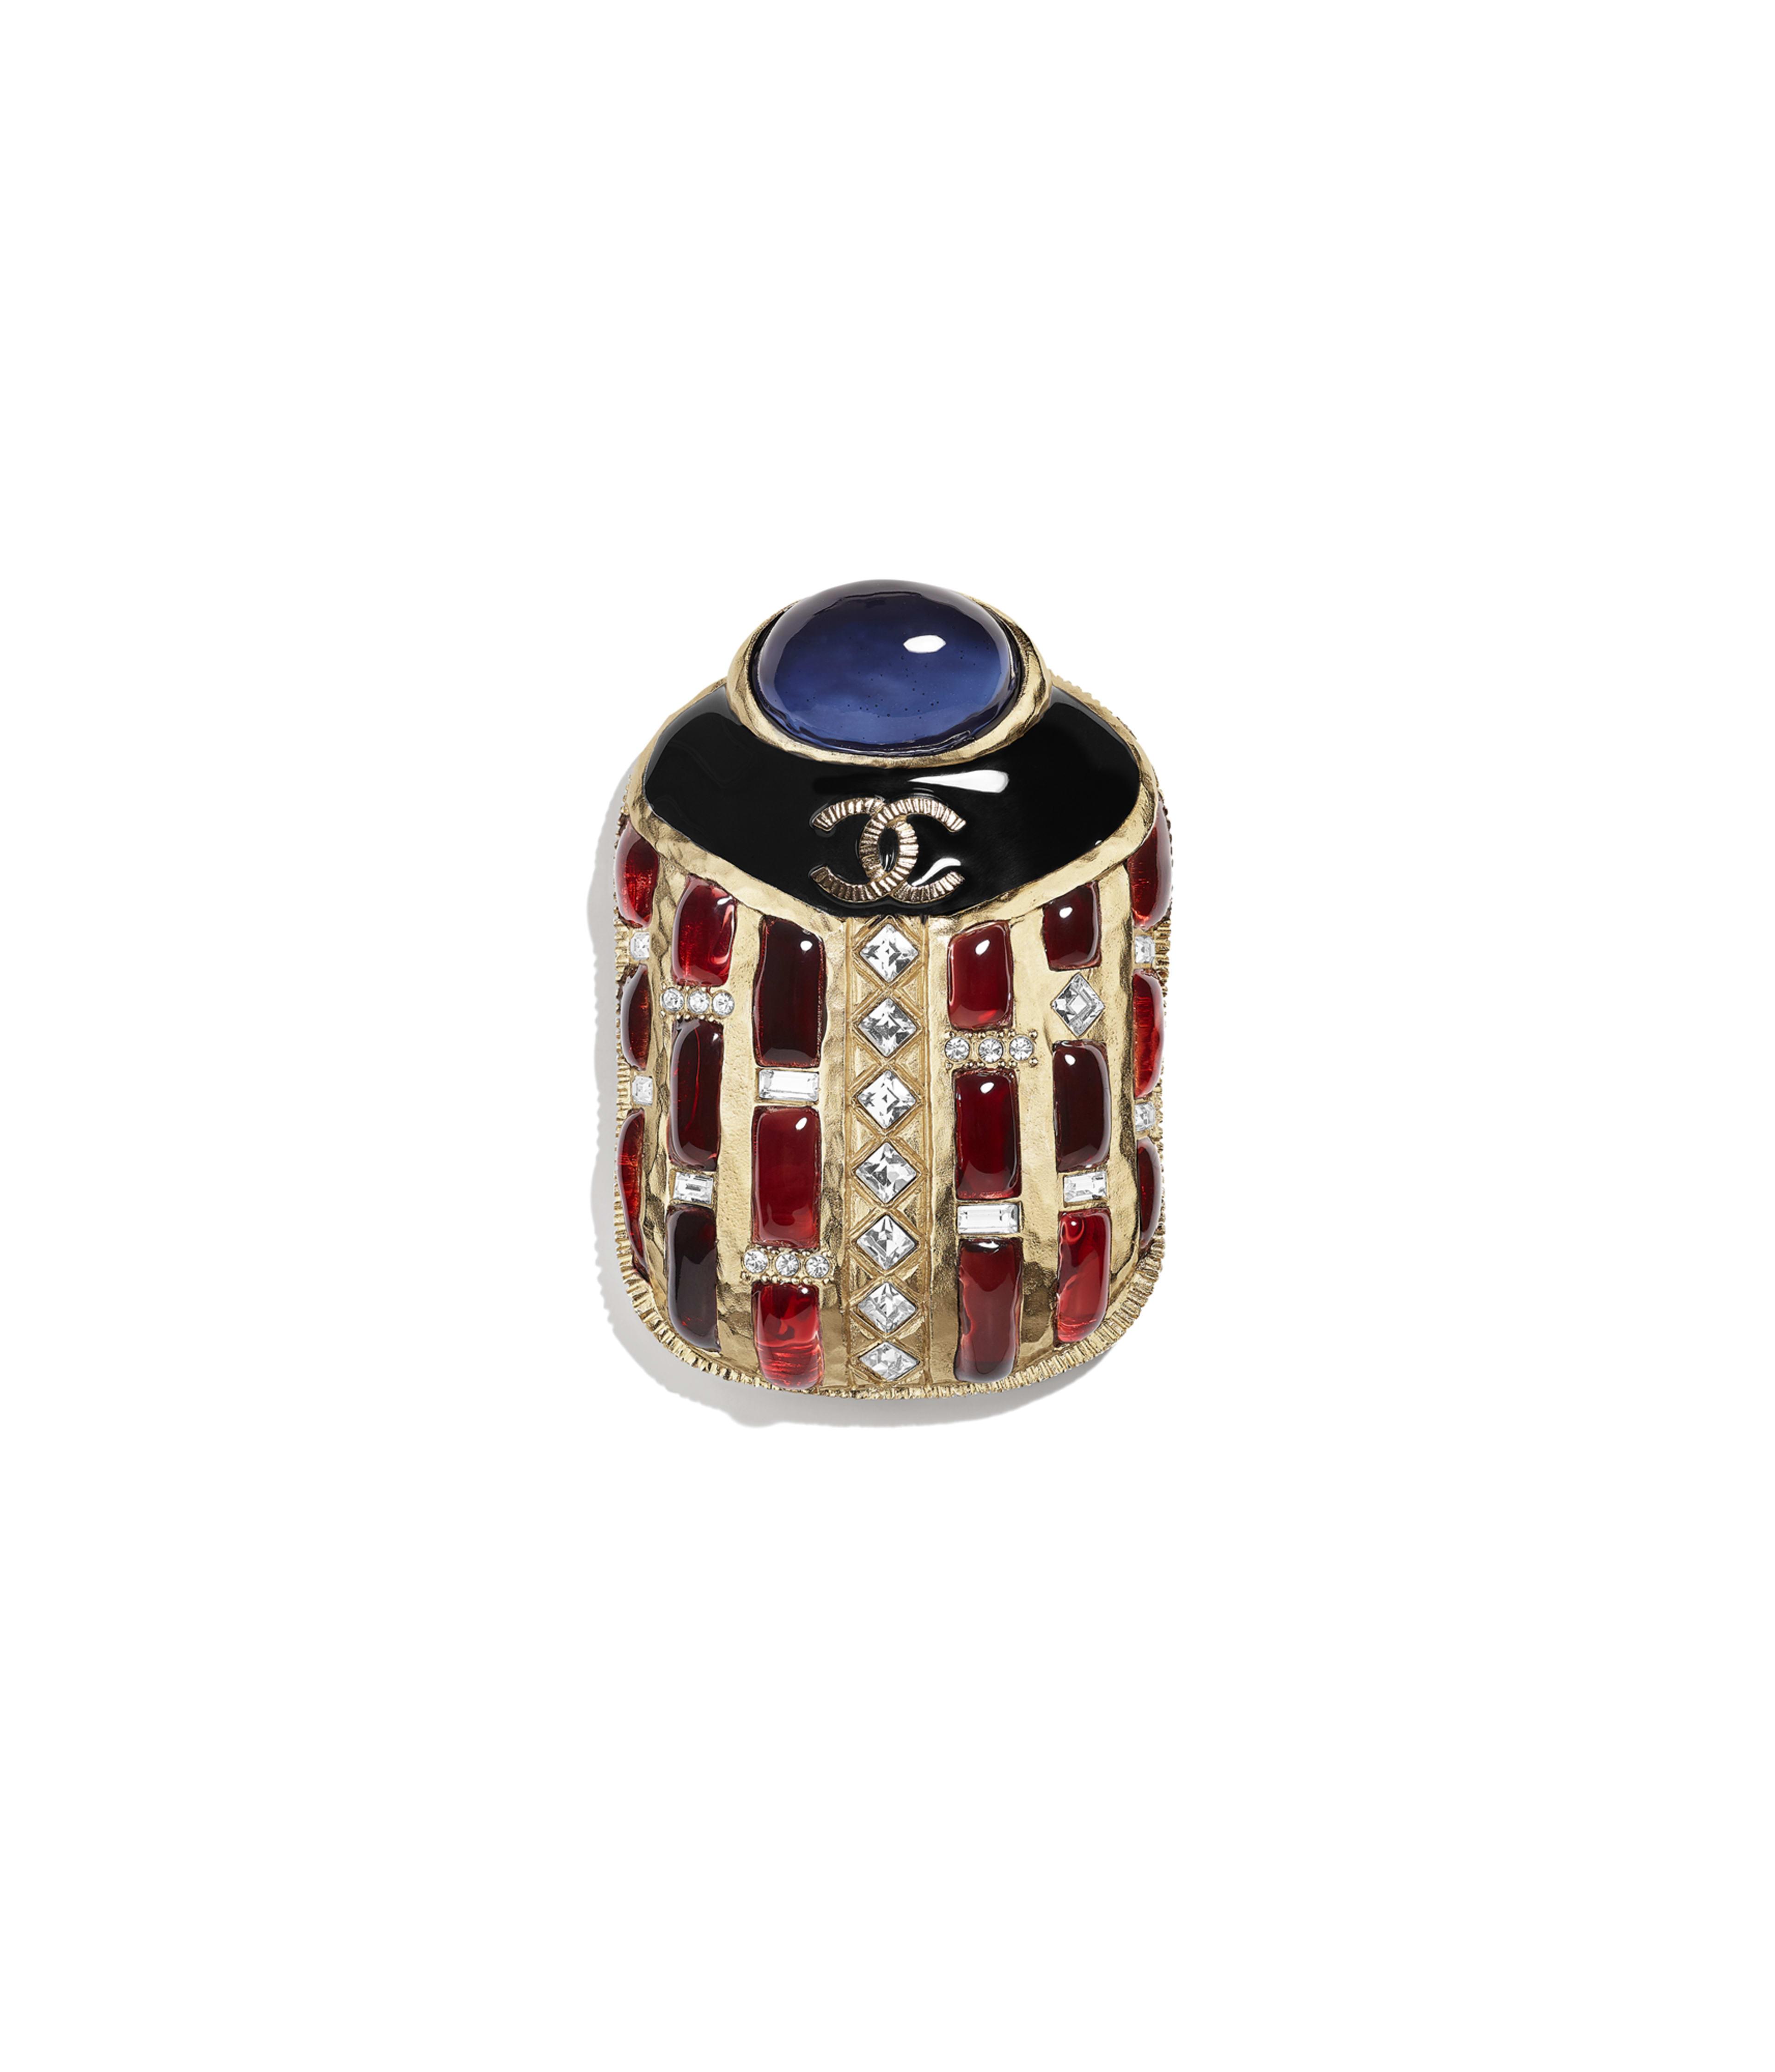 94ced7abc Brooch Metal, Strass & Resin, Gold, Black, Red, Blue & Crystal Ref.  AB1995Y47781Z9209